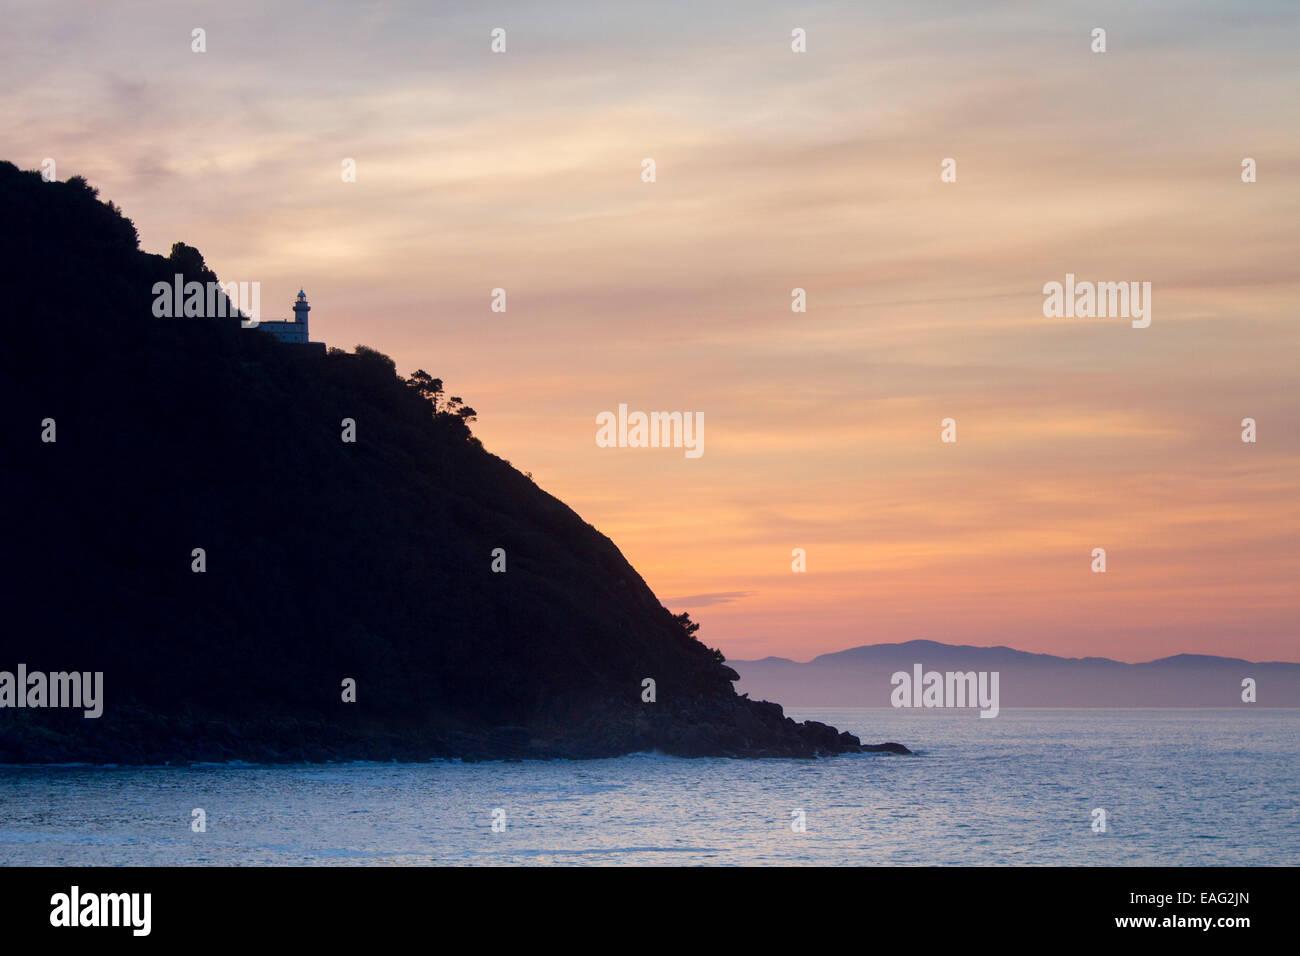 Sunset in Donostia - San Sebastian. - Stock Image